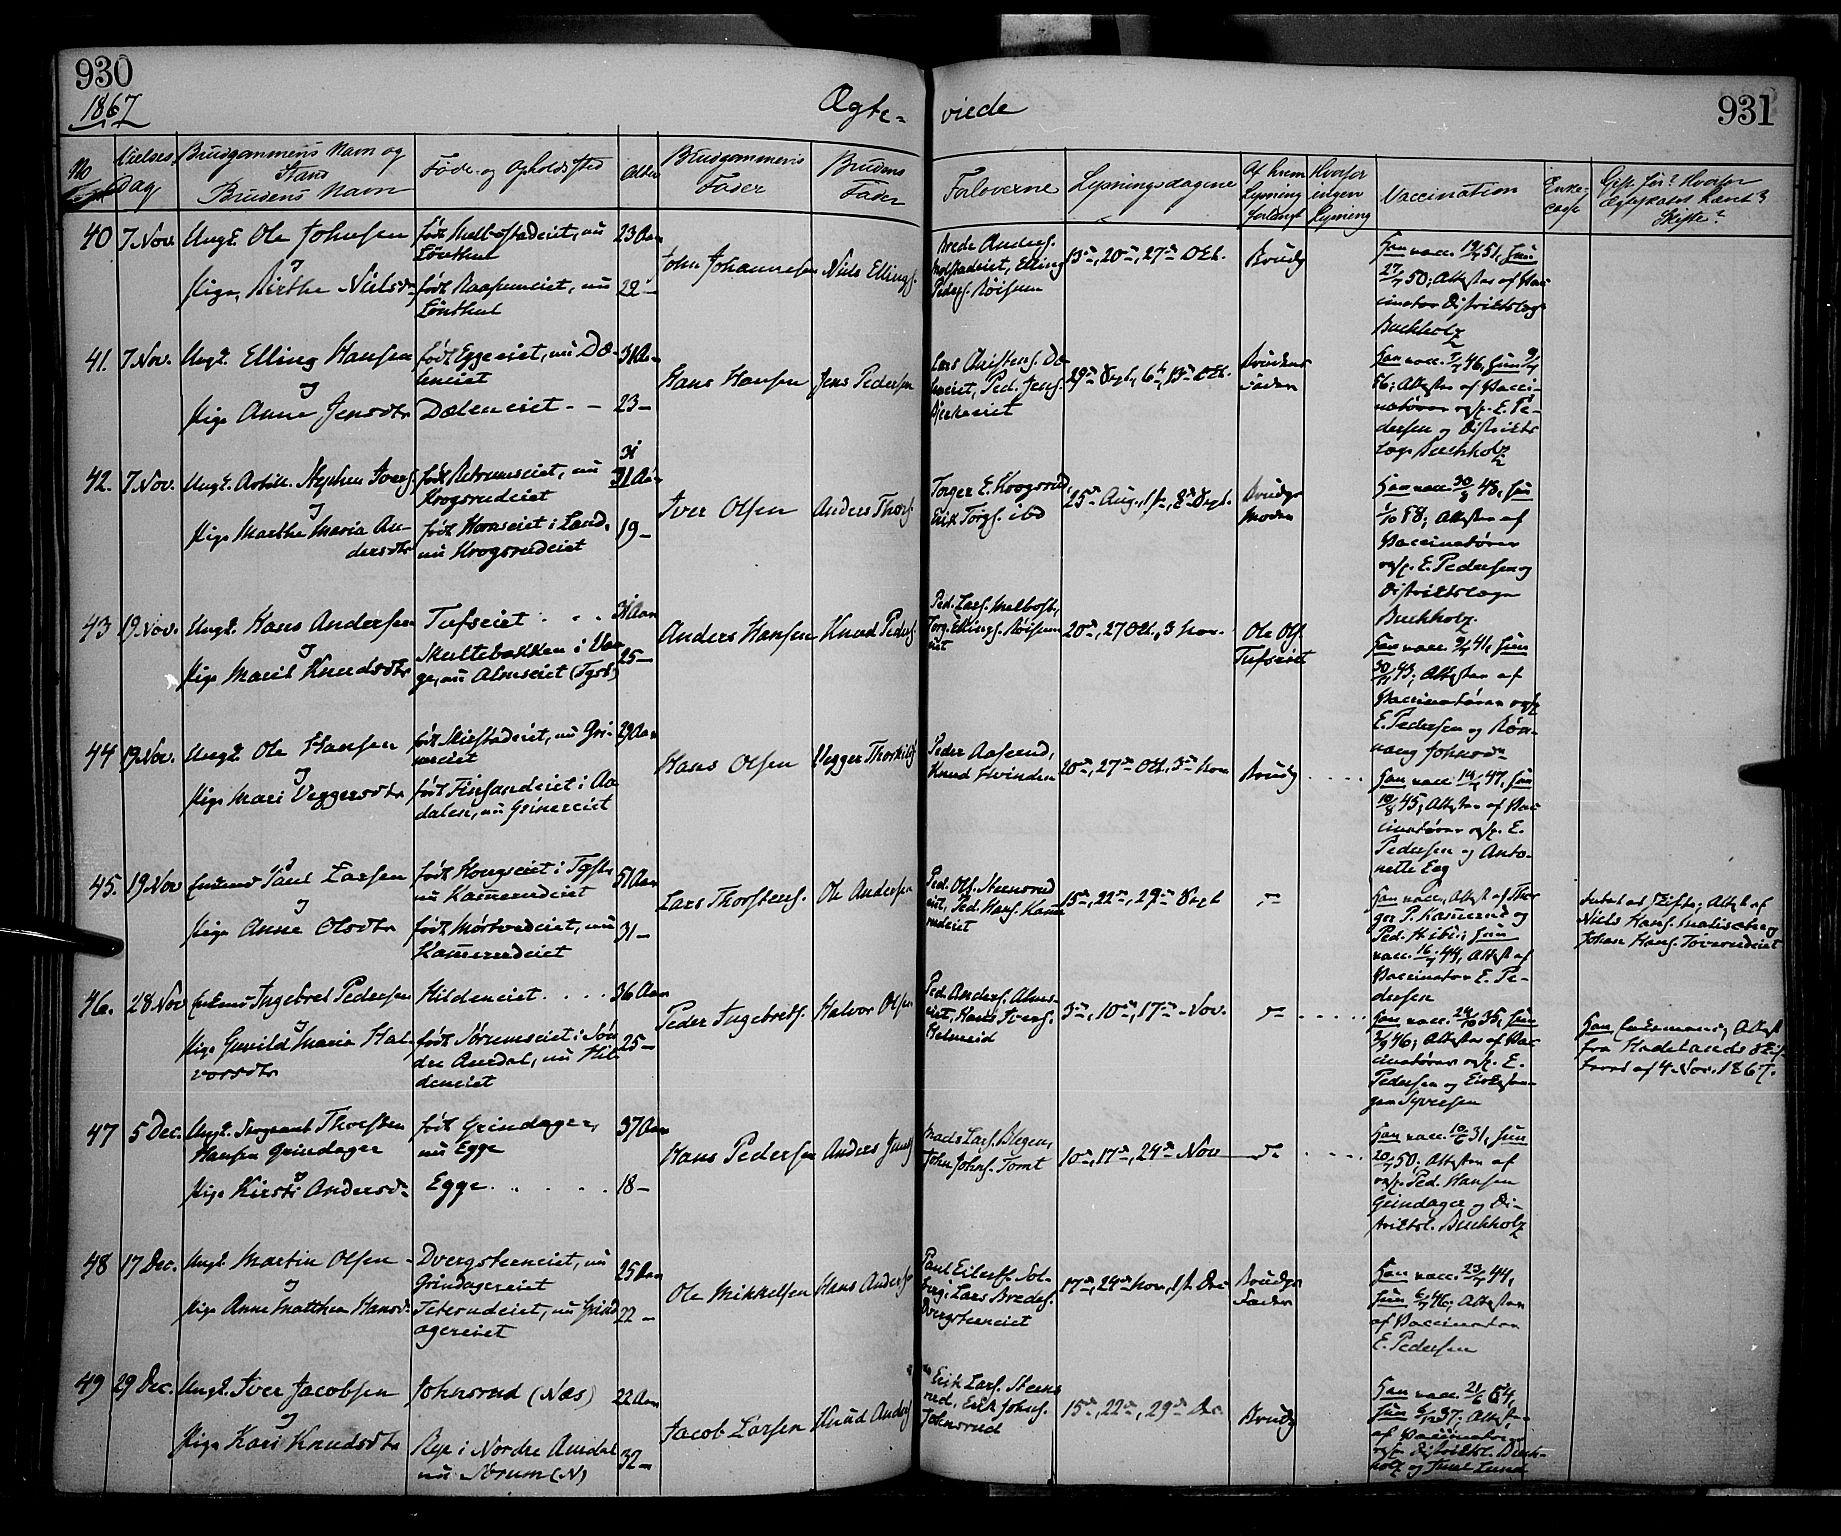 SAH, Gran prestekontor, Ministerialbok nr. 12, 1856-1874, s. 930-931